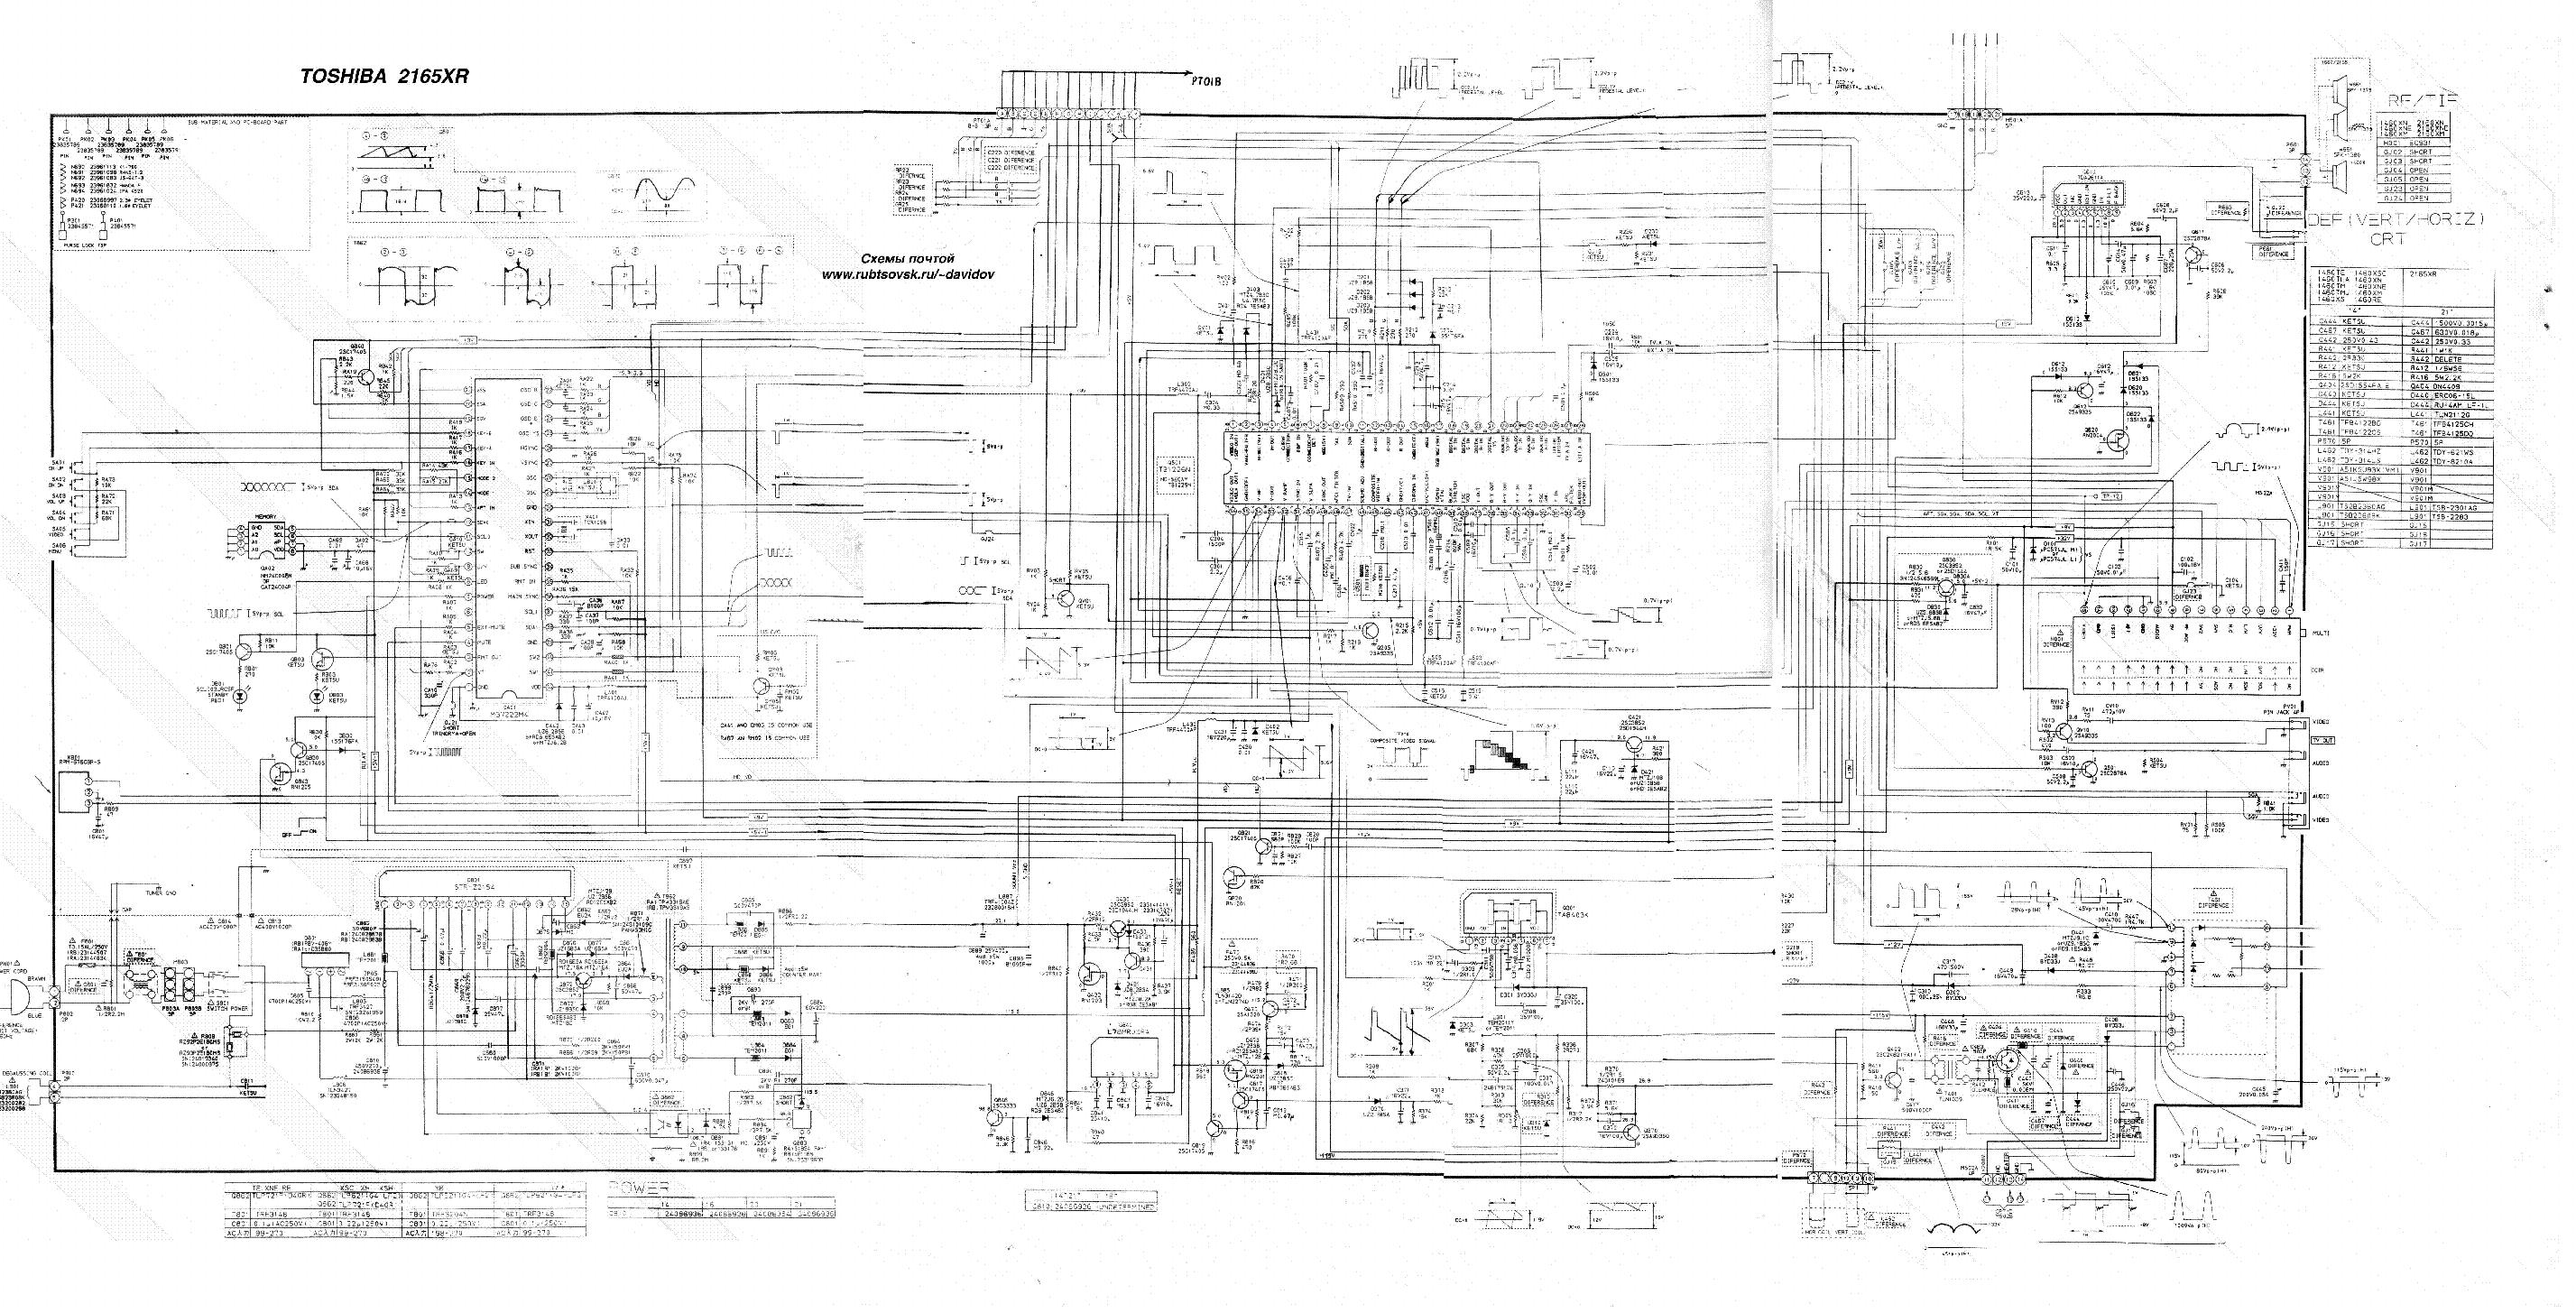 toshiba 51hc85 57hc85 65hc15 65hc85 service manual